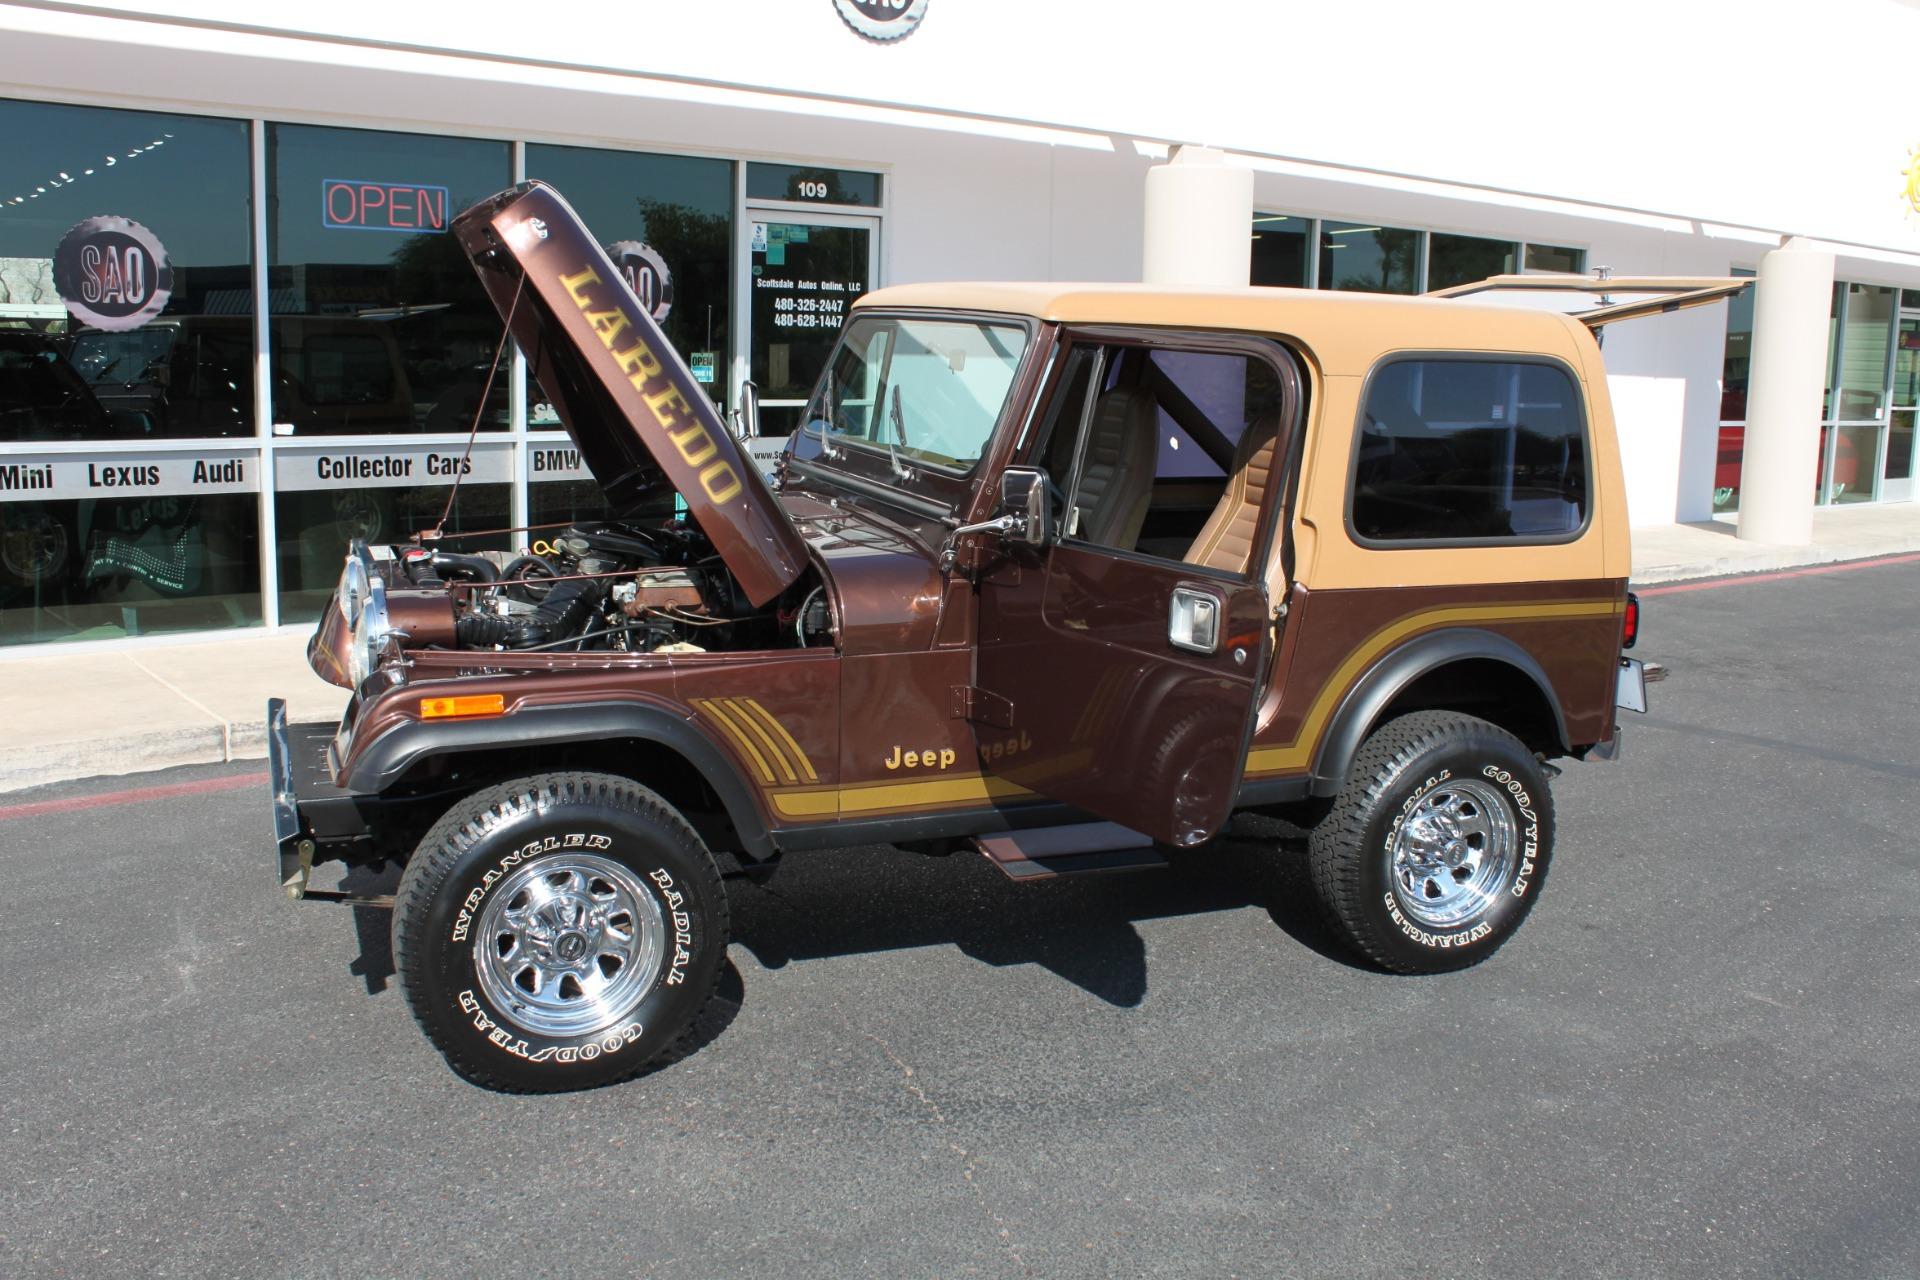 Used-1985-Jeep-CJ-7-Laredo-4WD-Land-Cruiser